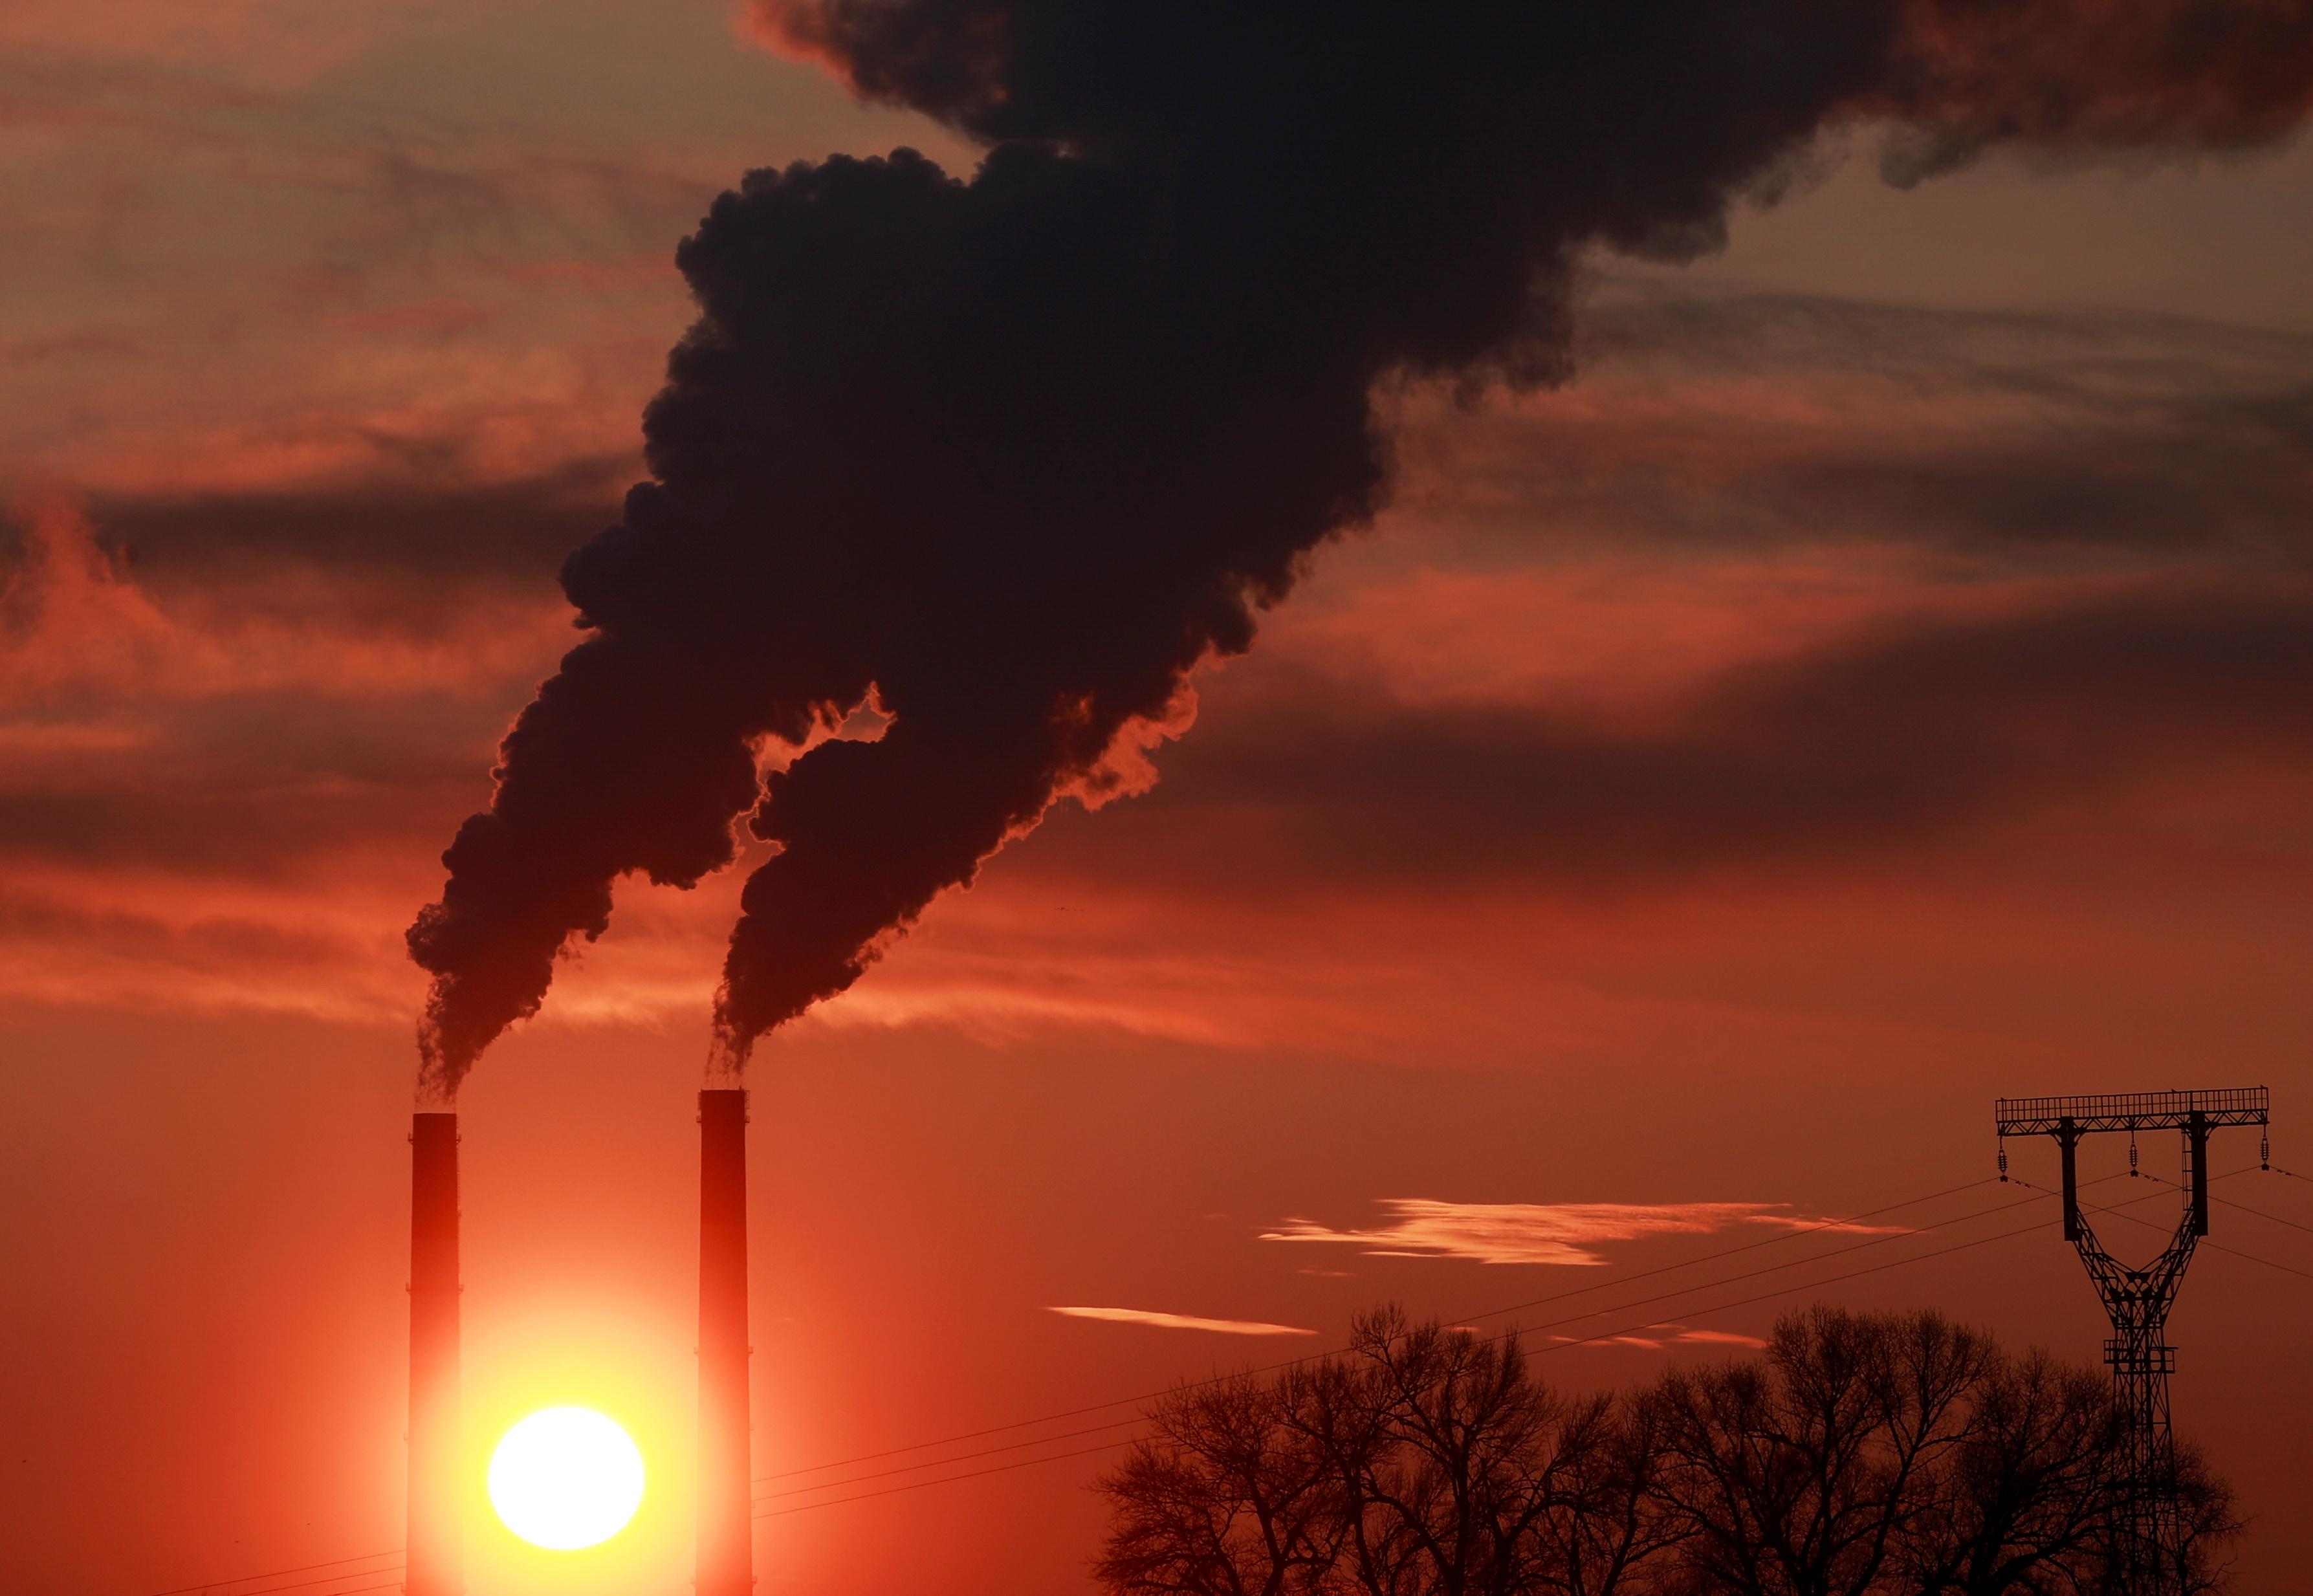 The sun sets behind chimneys of a thermal power plant in Kyiv, Ukraine February 2, 2021.  REUTERS/Valentyn Ogirenko